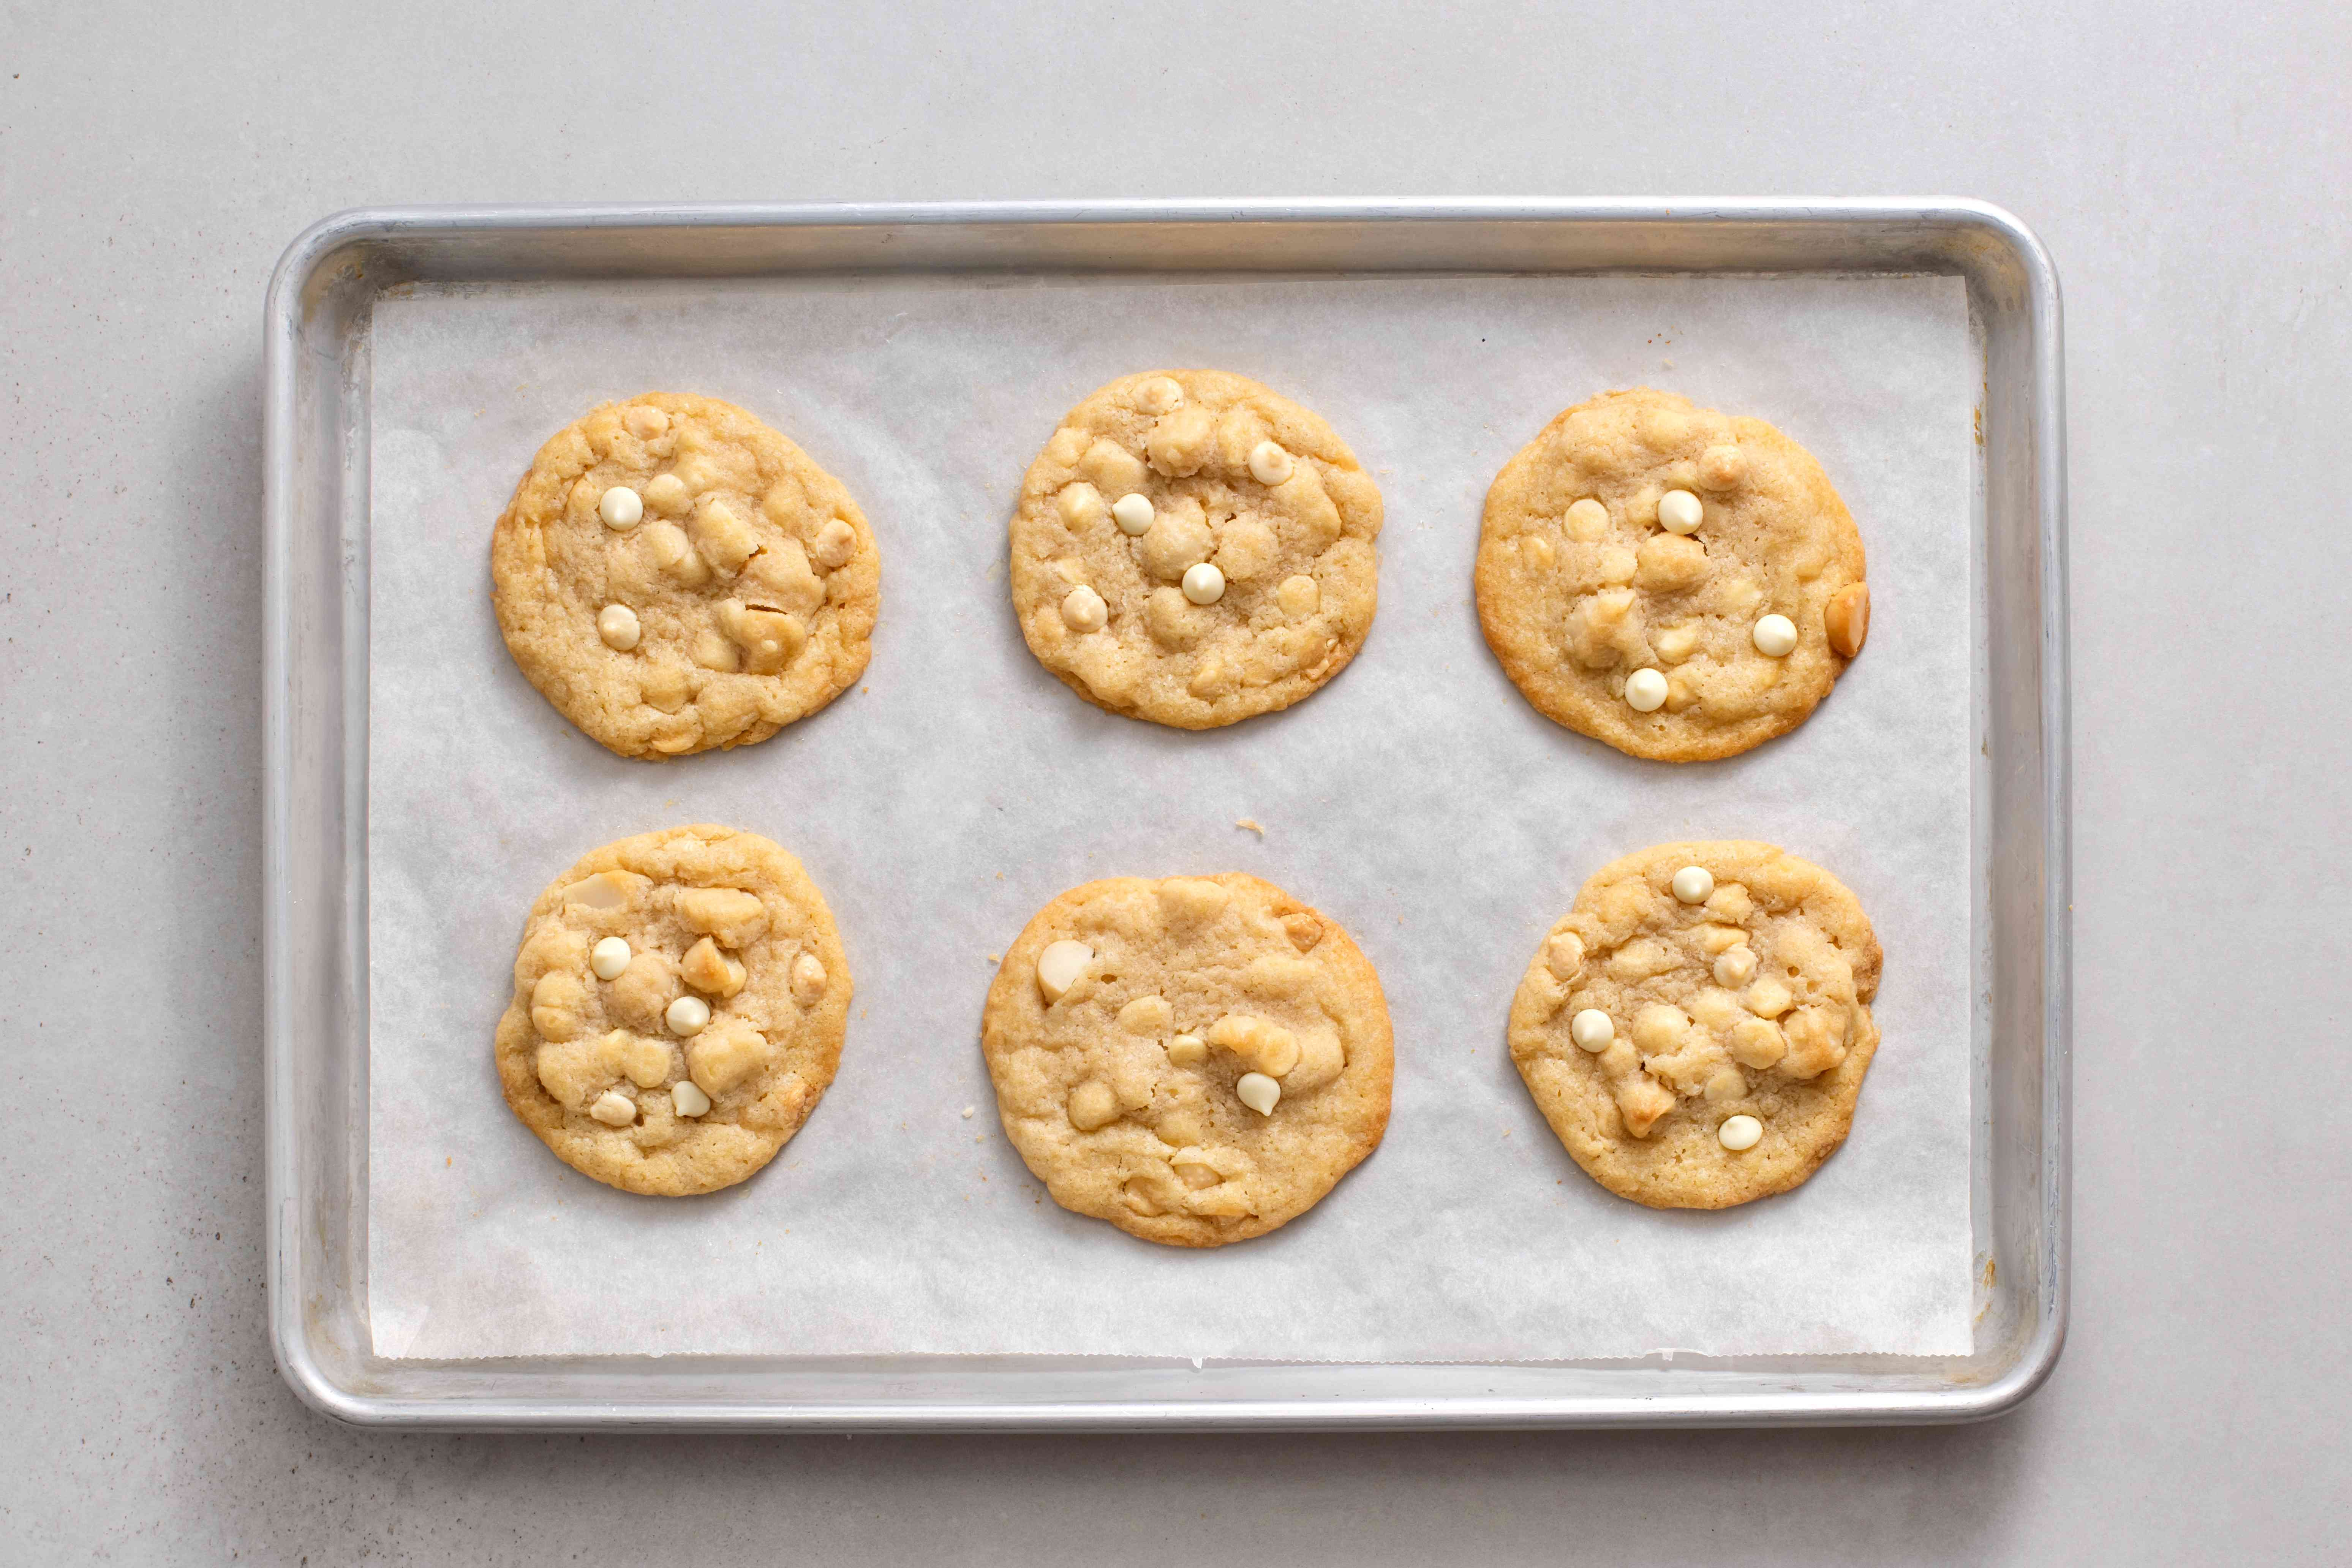 White Chocolate Macadamia Nut Cookies on a baking sheet